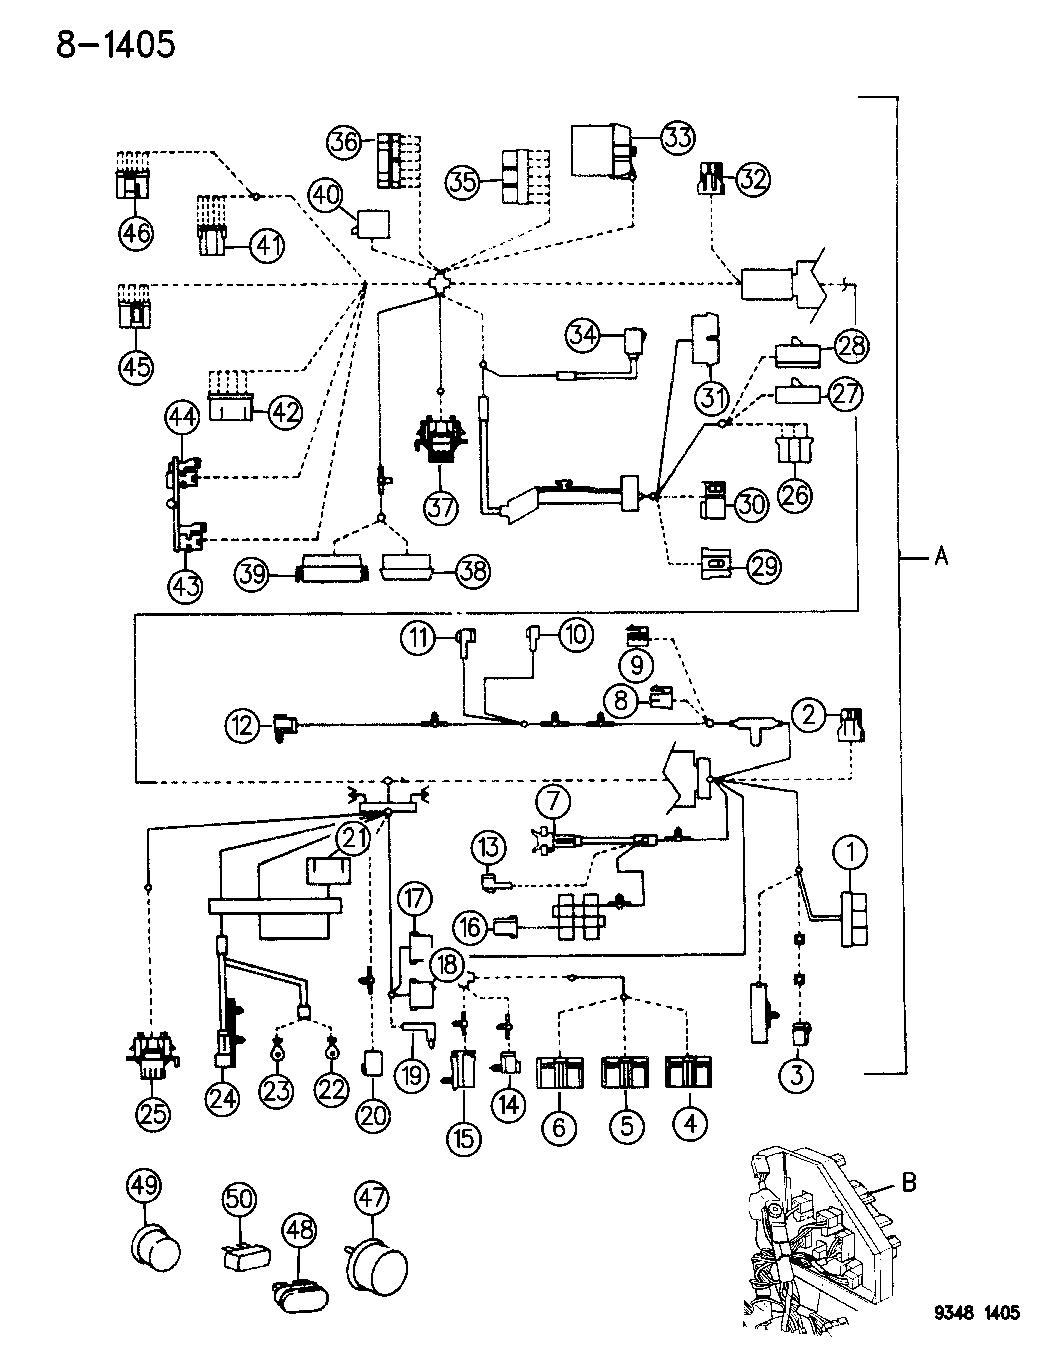 1995 Chrysler Lhs Wiring - Instrument Panel